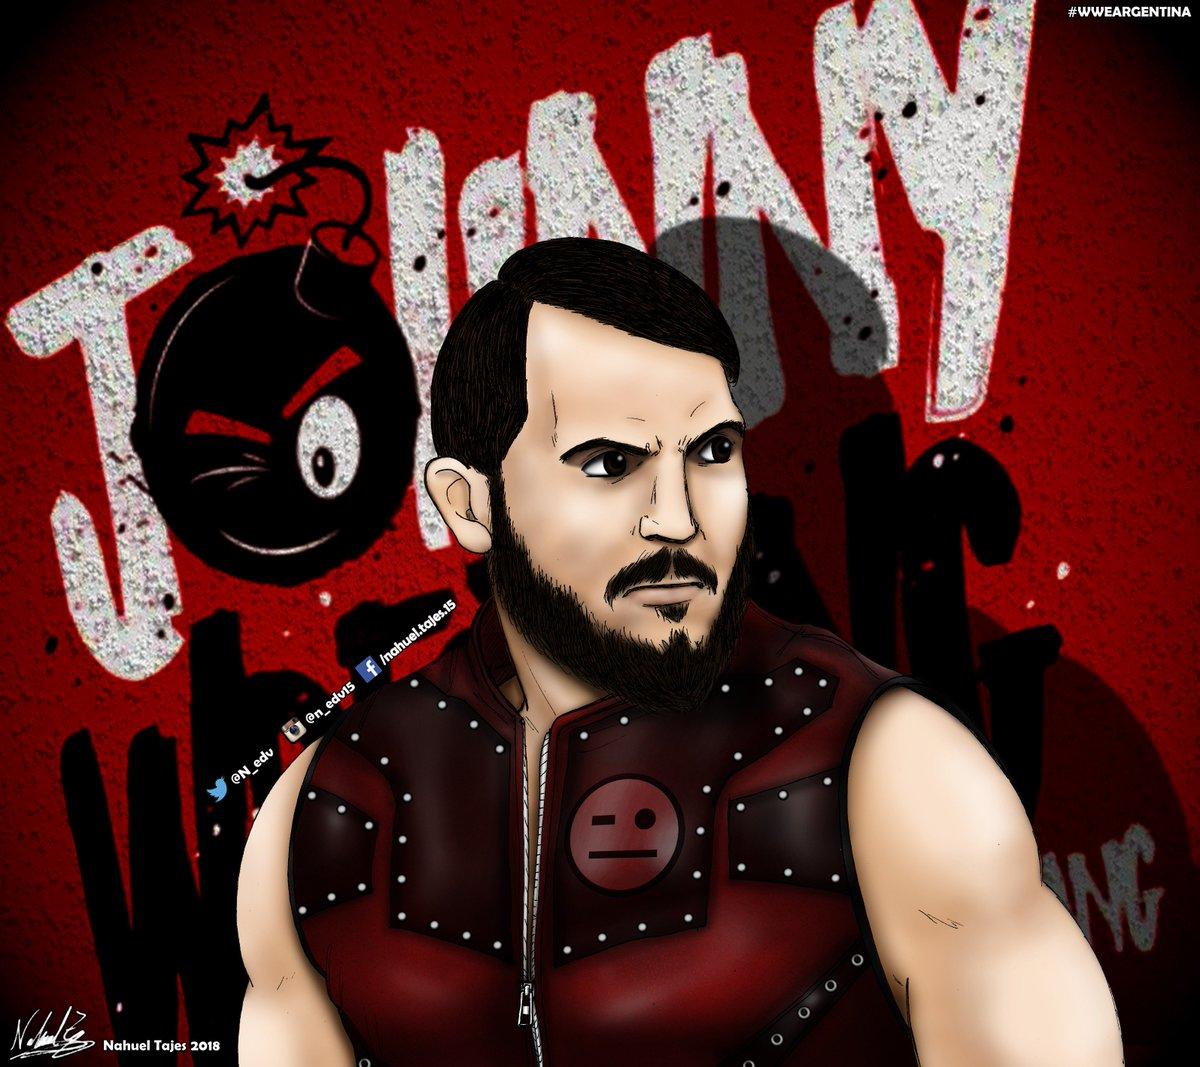 Johnny Gargano  @JohnnyGargano hope you like it  #fanartfriday #JohnnyWrestling #BeYourself #WWE #WWENXT #JohnnyGargano #drawing #dibujo #wrestling @wwe @WWENXT<br>http://pic.twitter.com/YMGZQ7XRWl